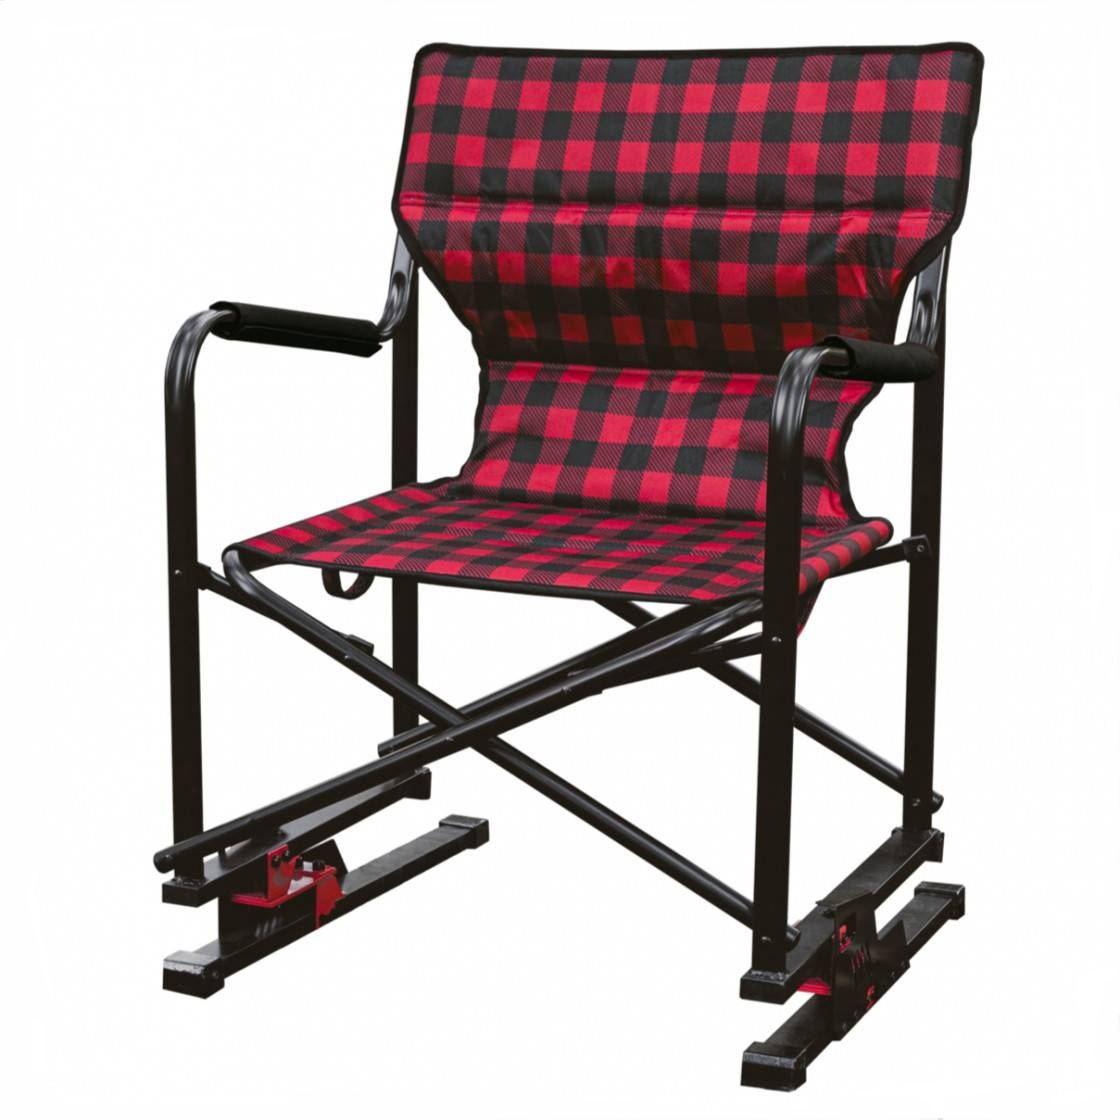 Spring Bear Chair Red Plaid